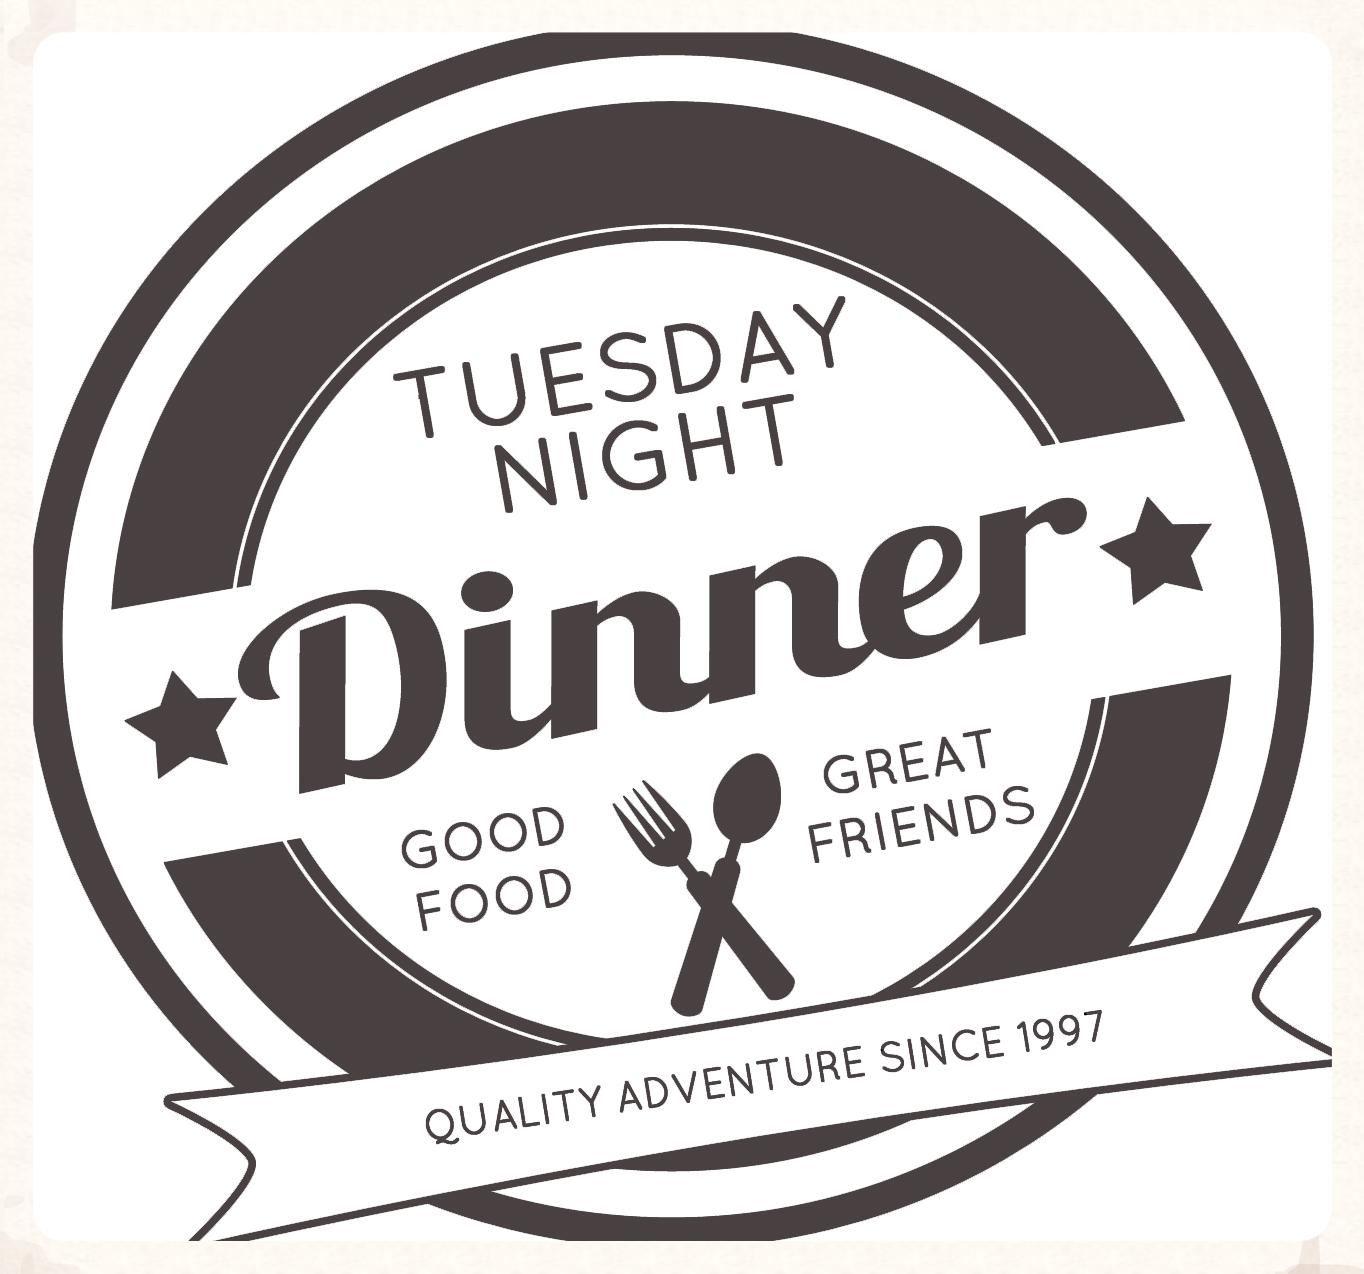 tues night dinner badge grey.jpg